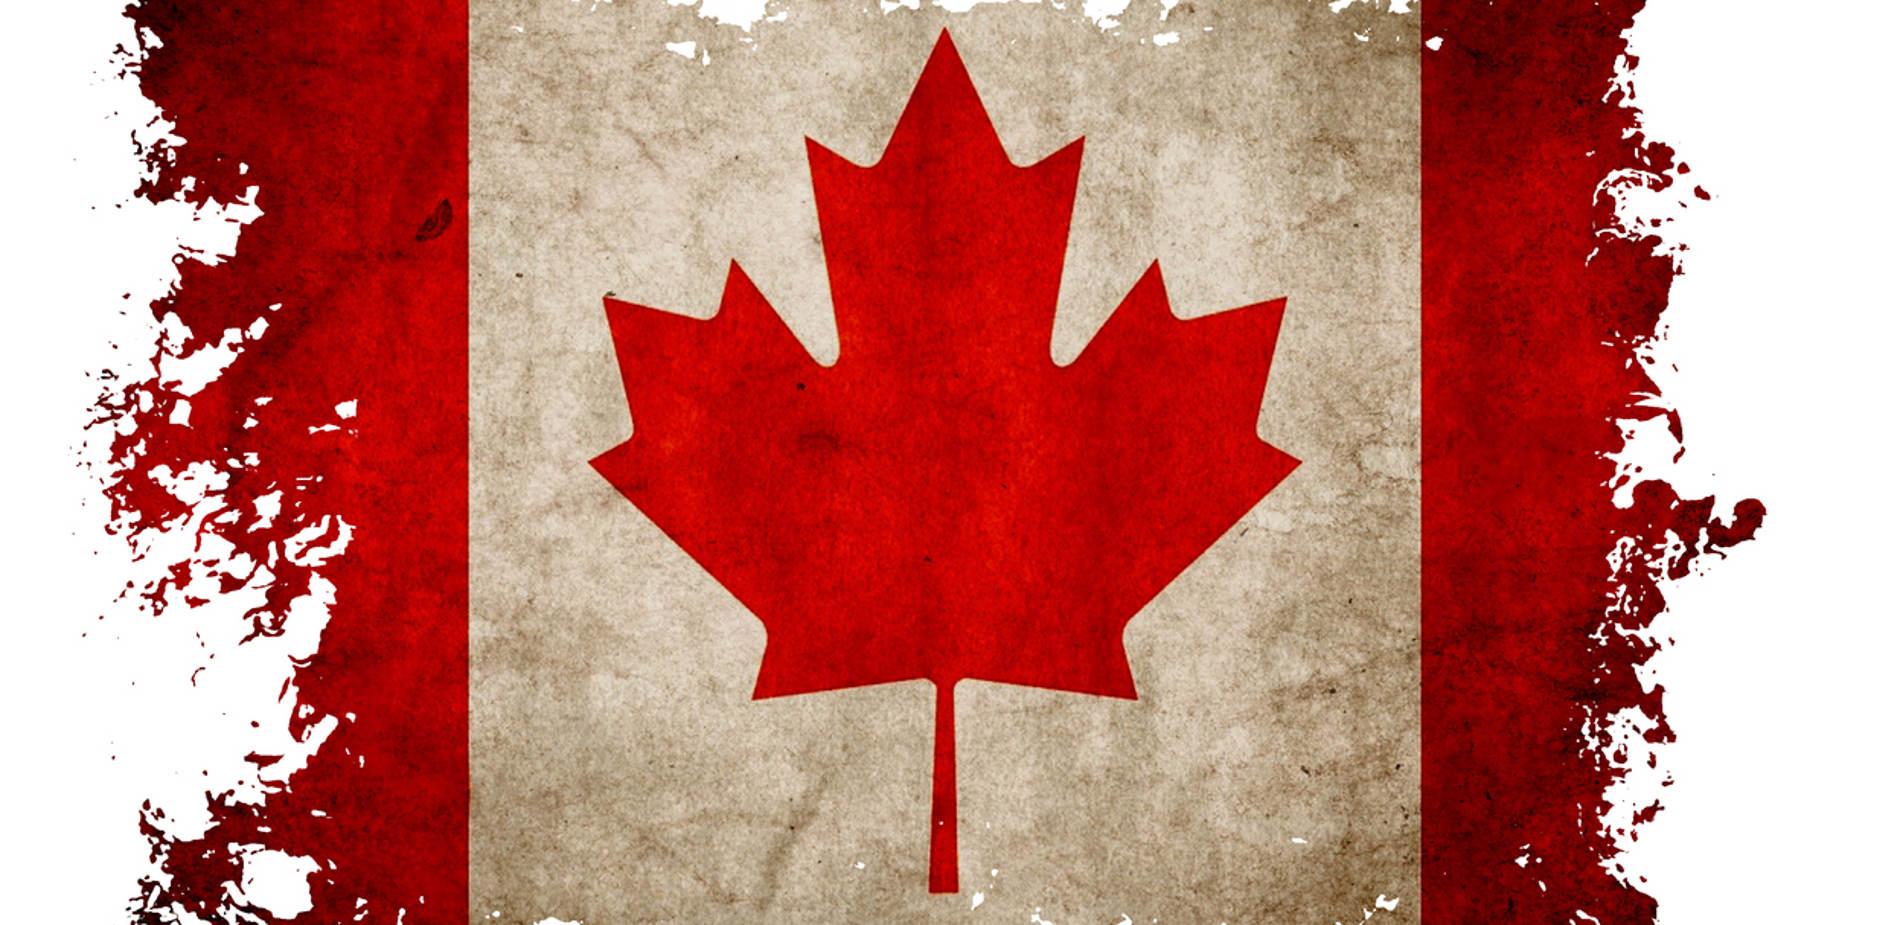 Best put options to short canadian housing market